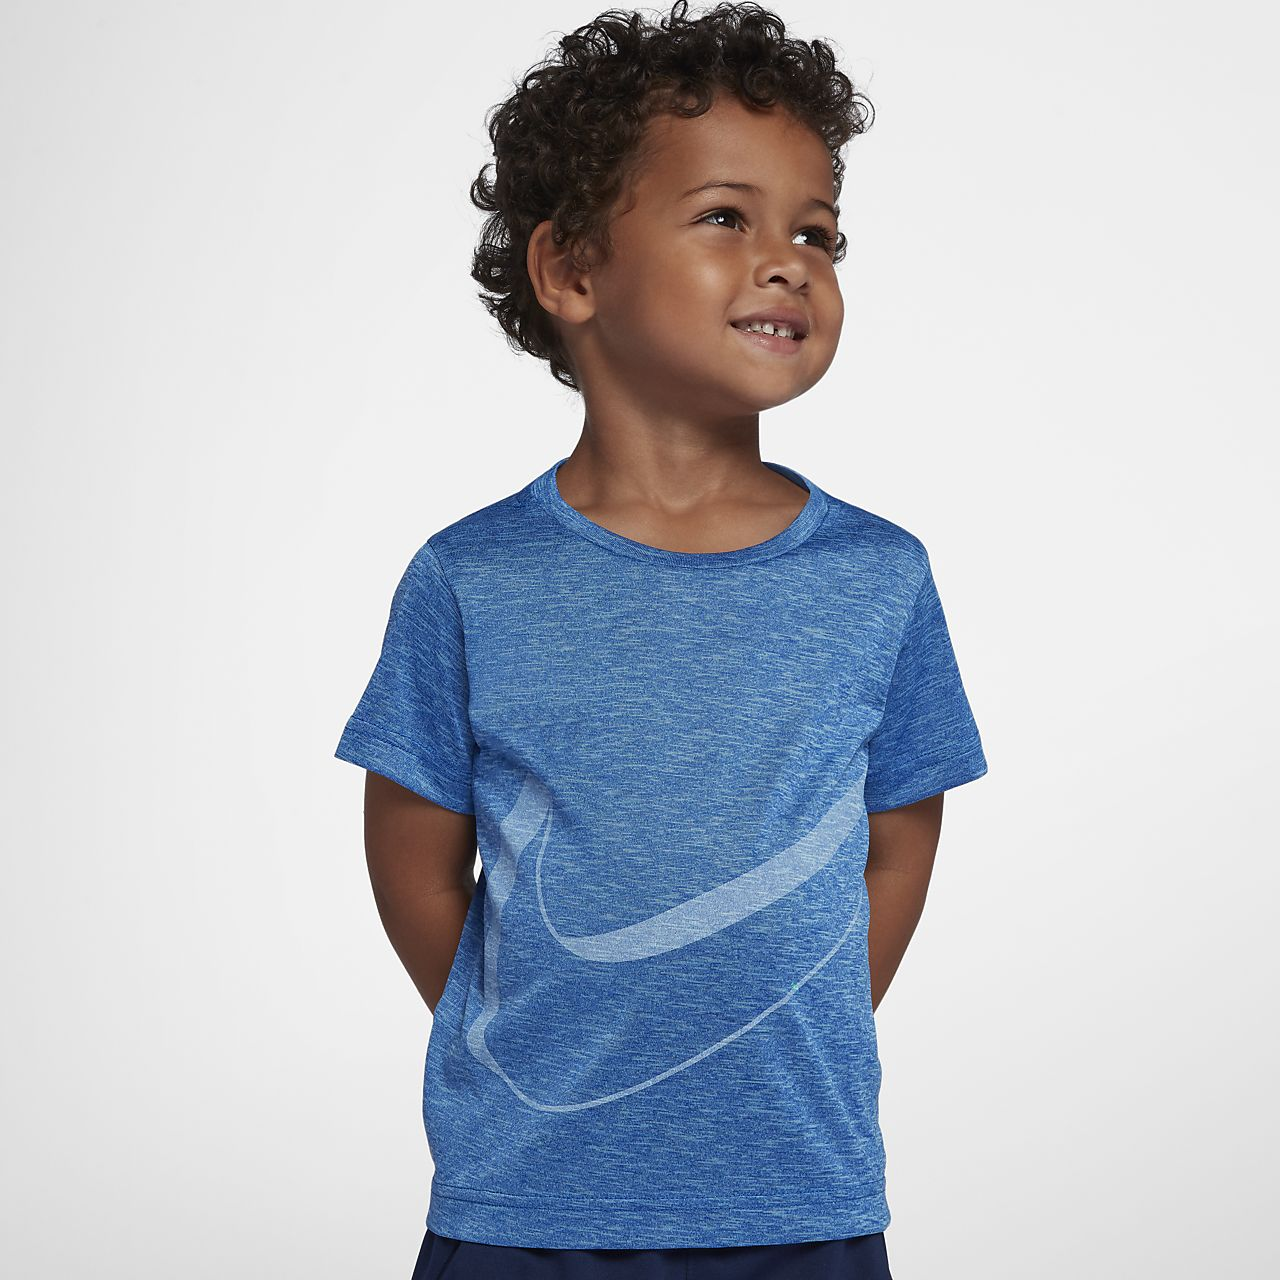 Nike Breathe-T-shirt til små børn